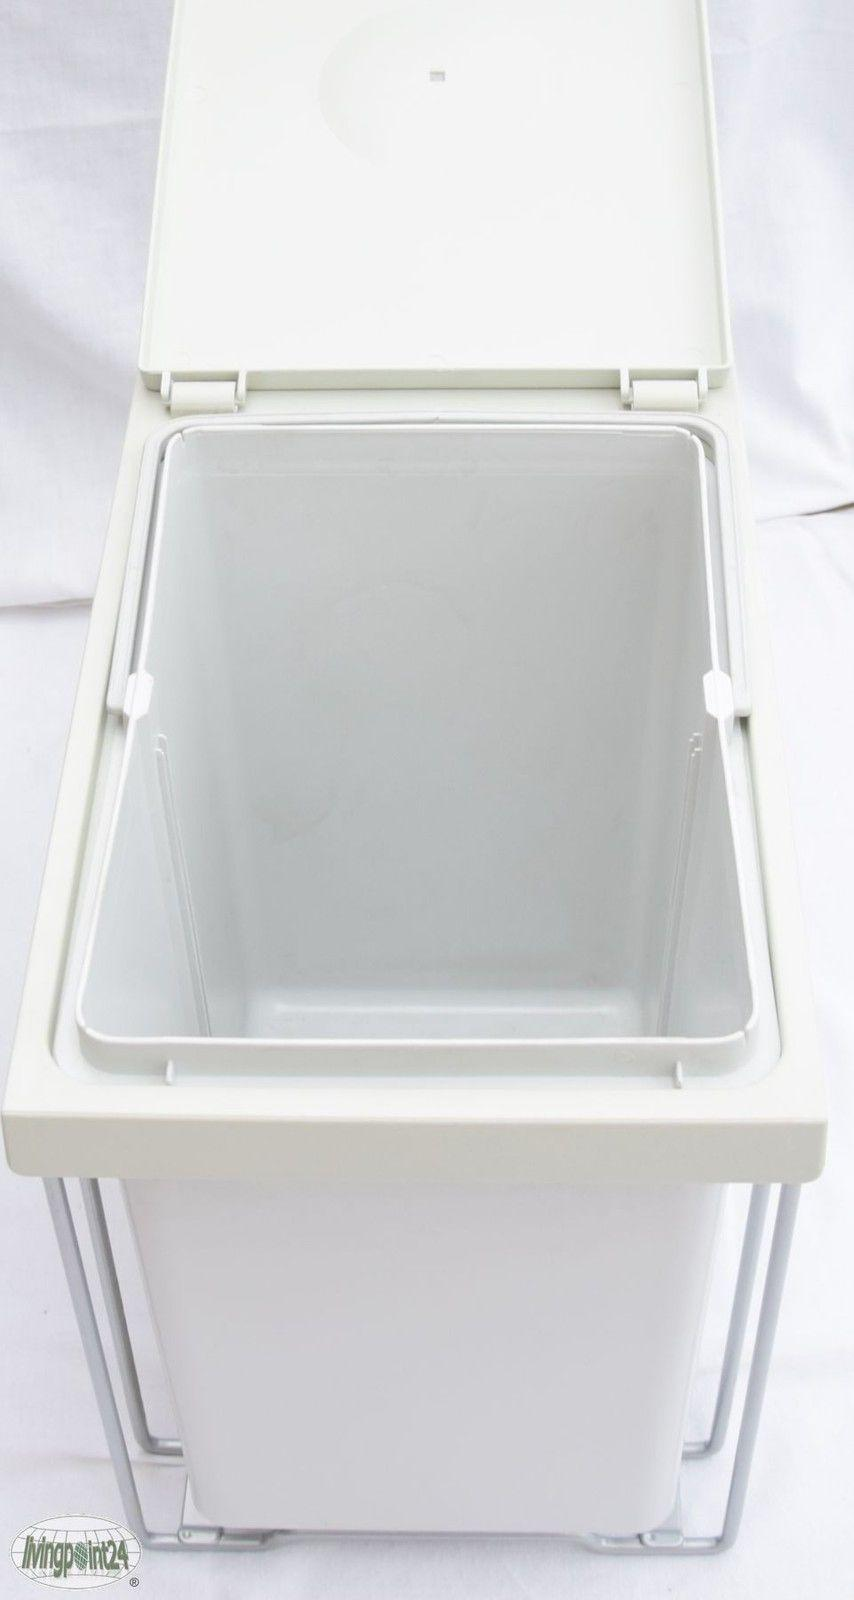 schrank mlleimer affordable full size of badezimmer waschtisch mit badmbel set fynn grau beton. Black Bedroom Furniture Sets. Home Design Ideas